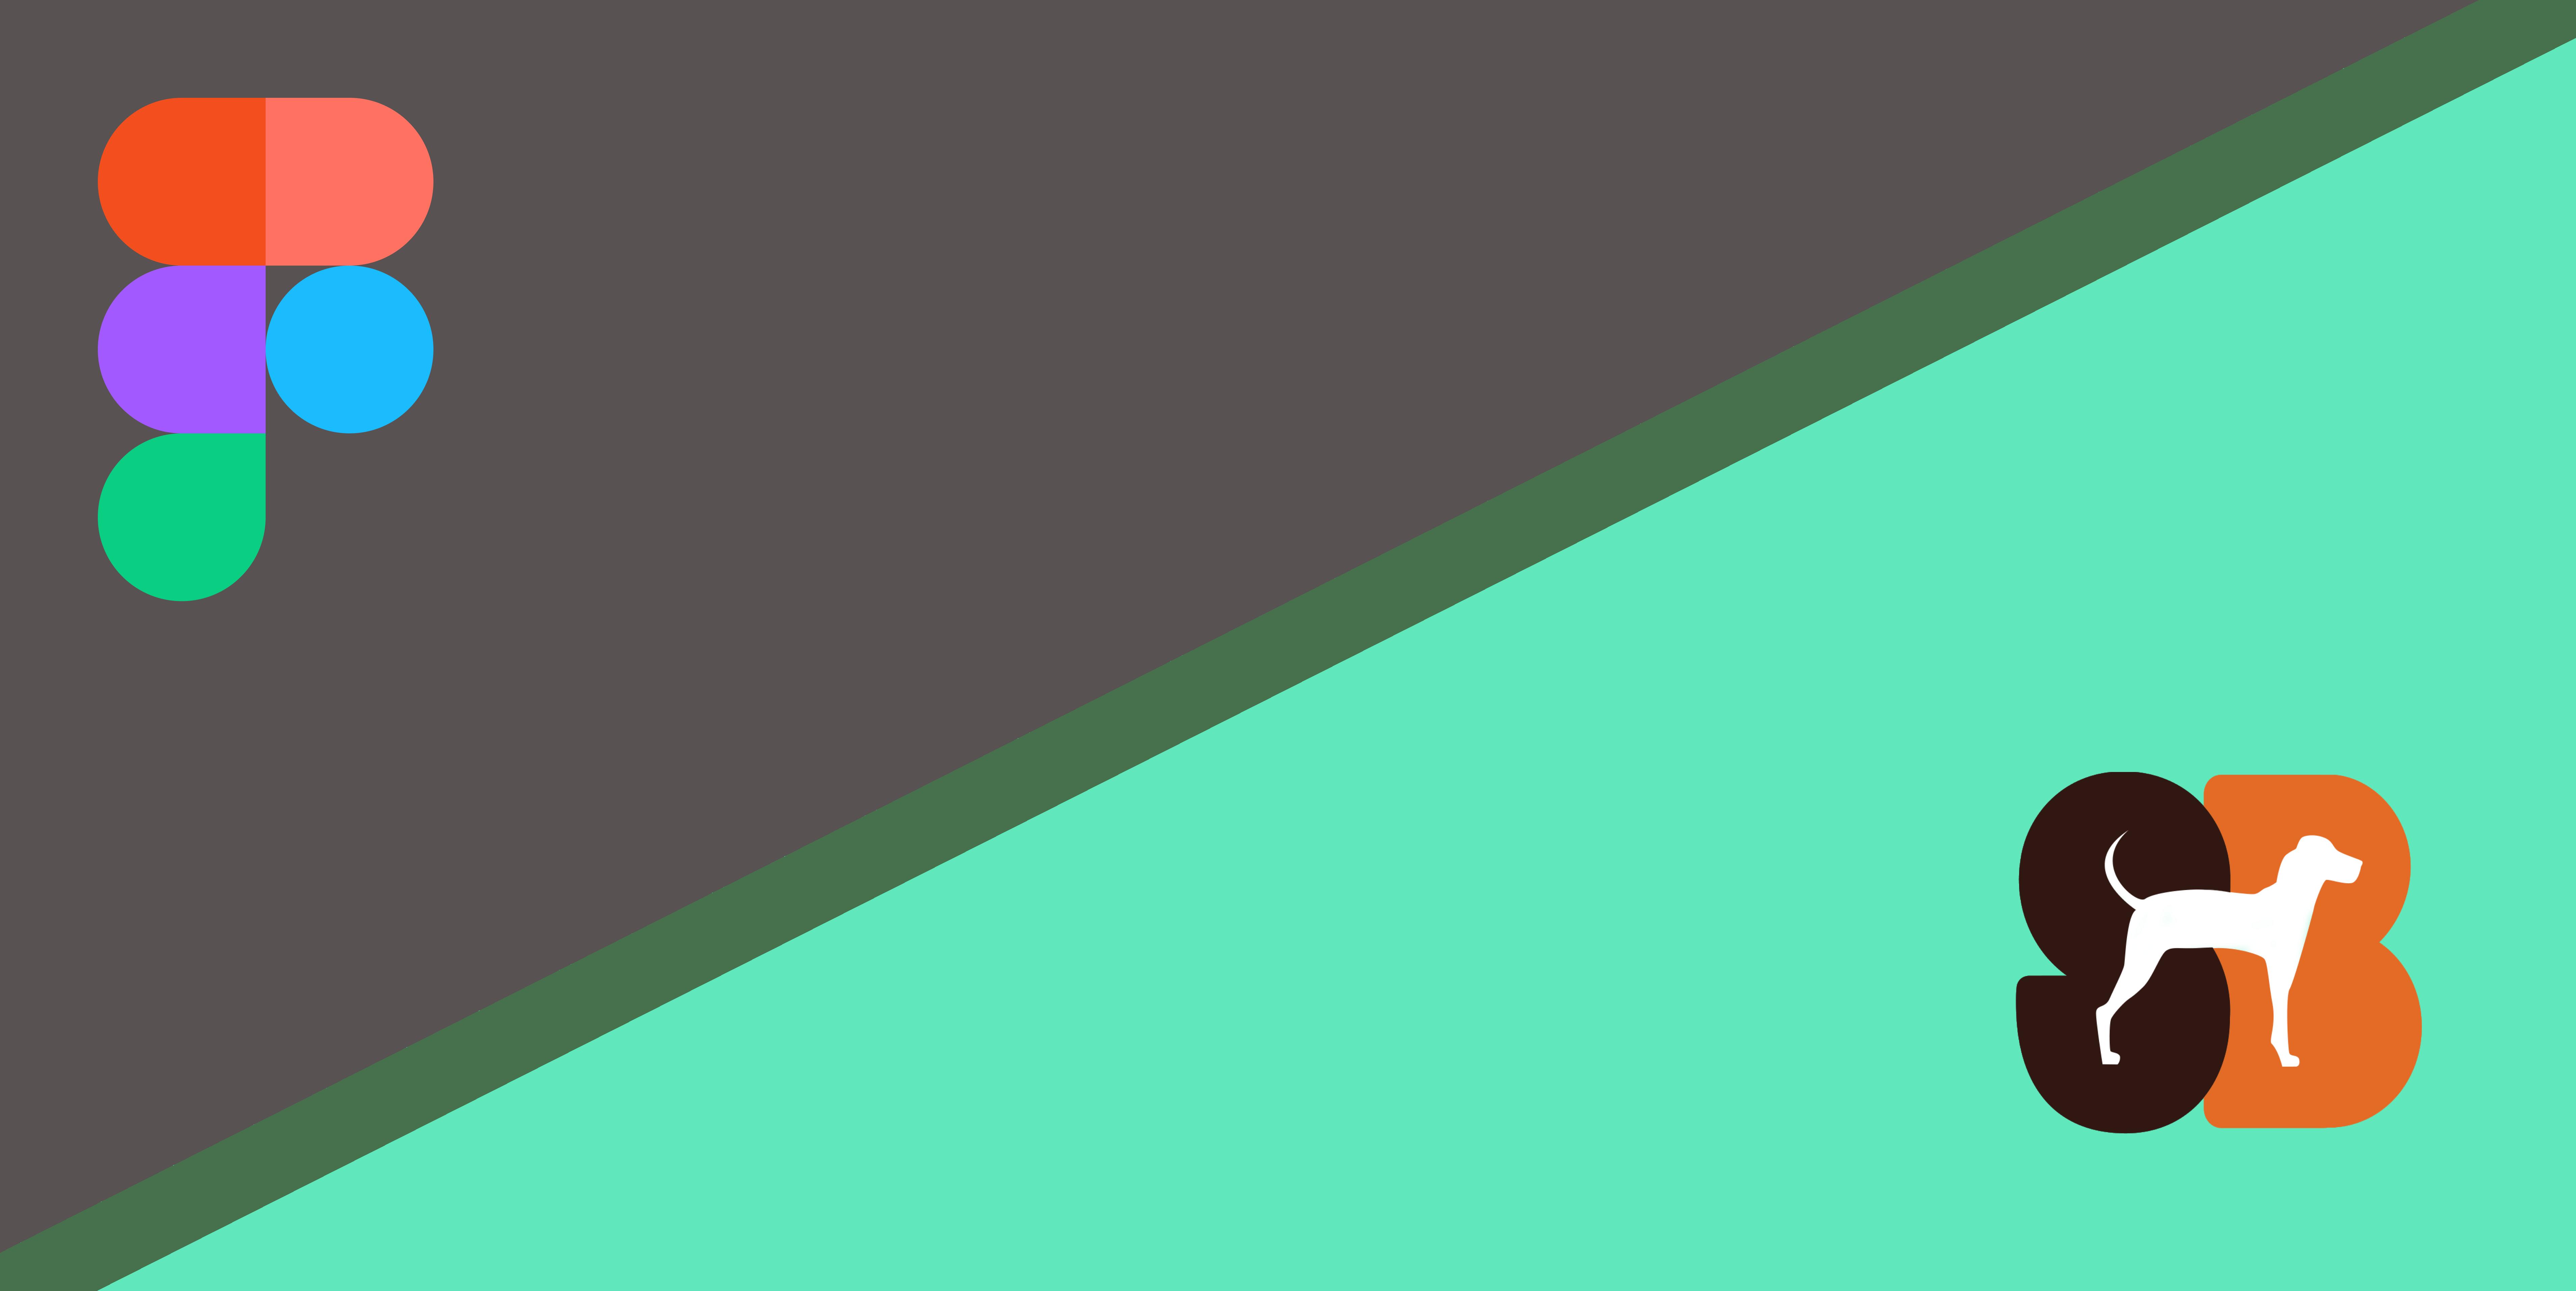 Figma + Standard Beagle Image